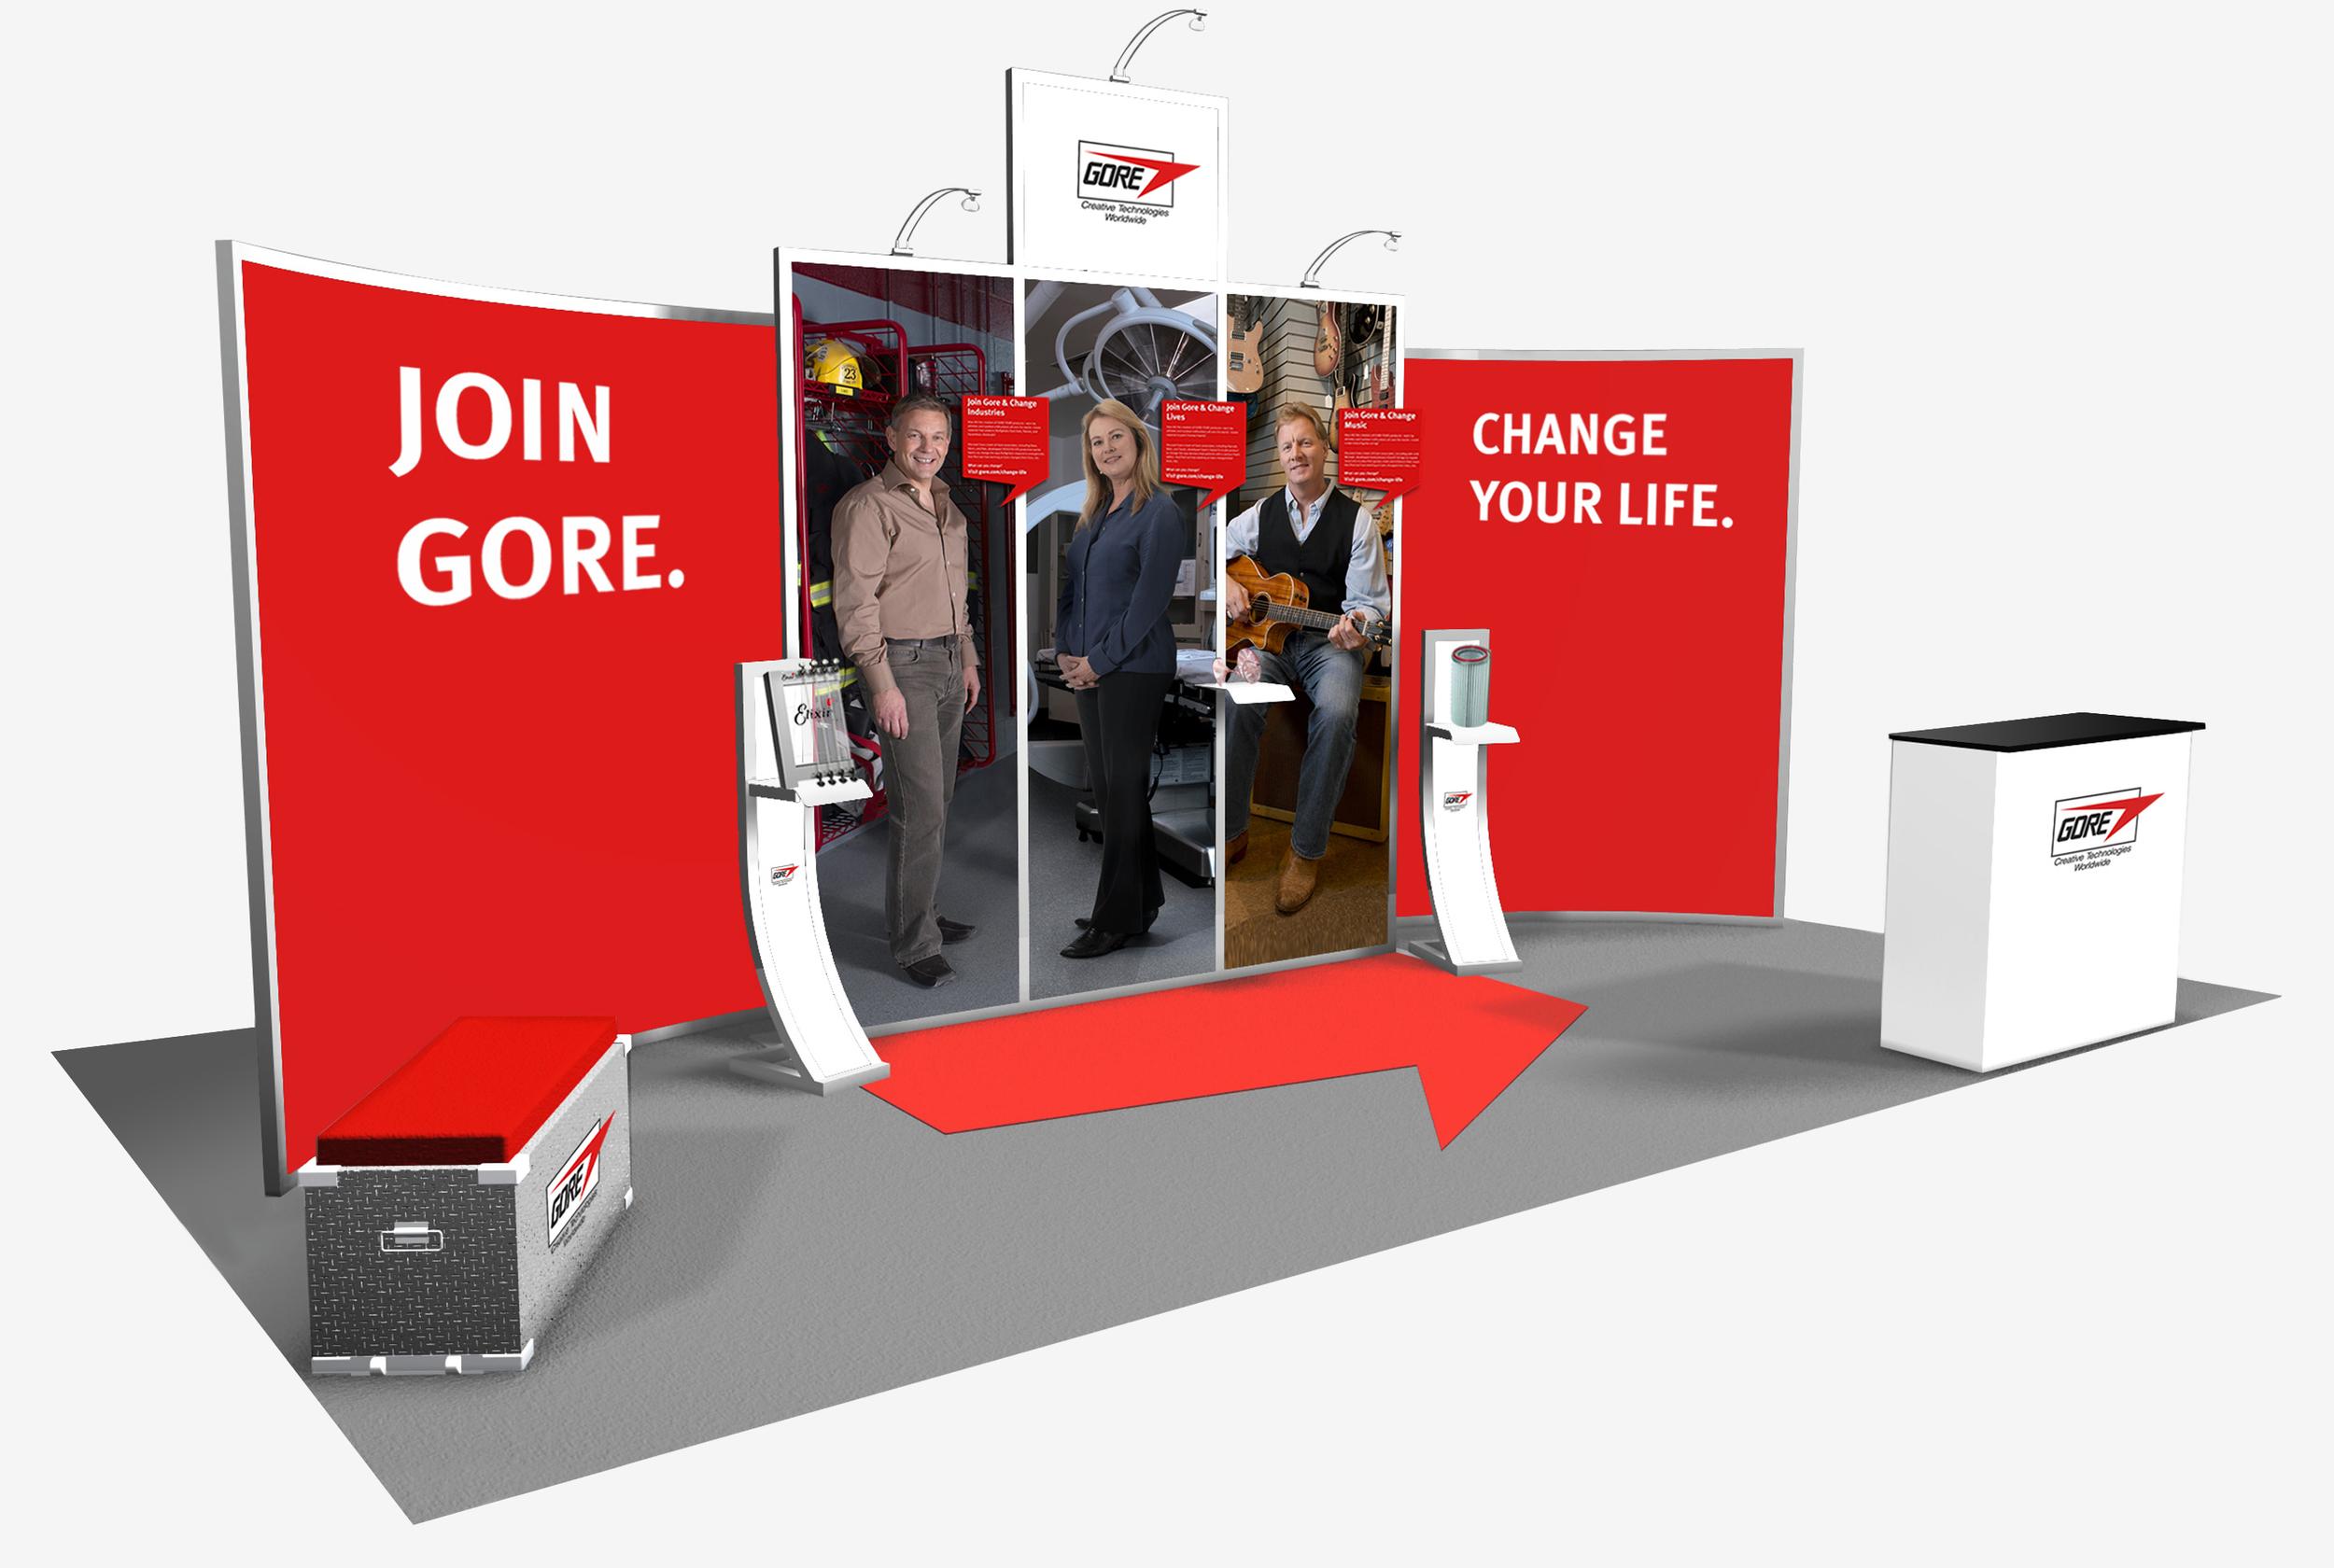 Gore employer brand exhibit